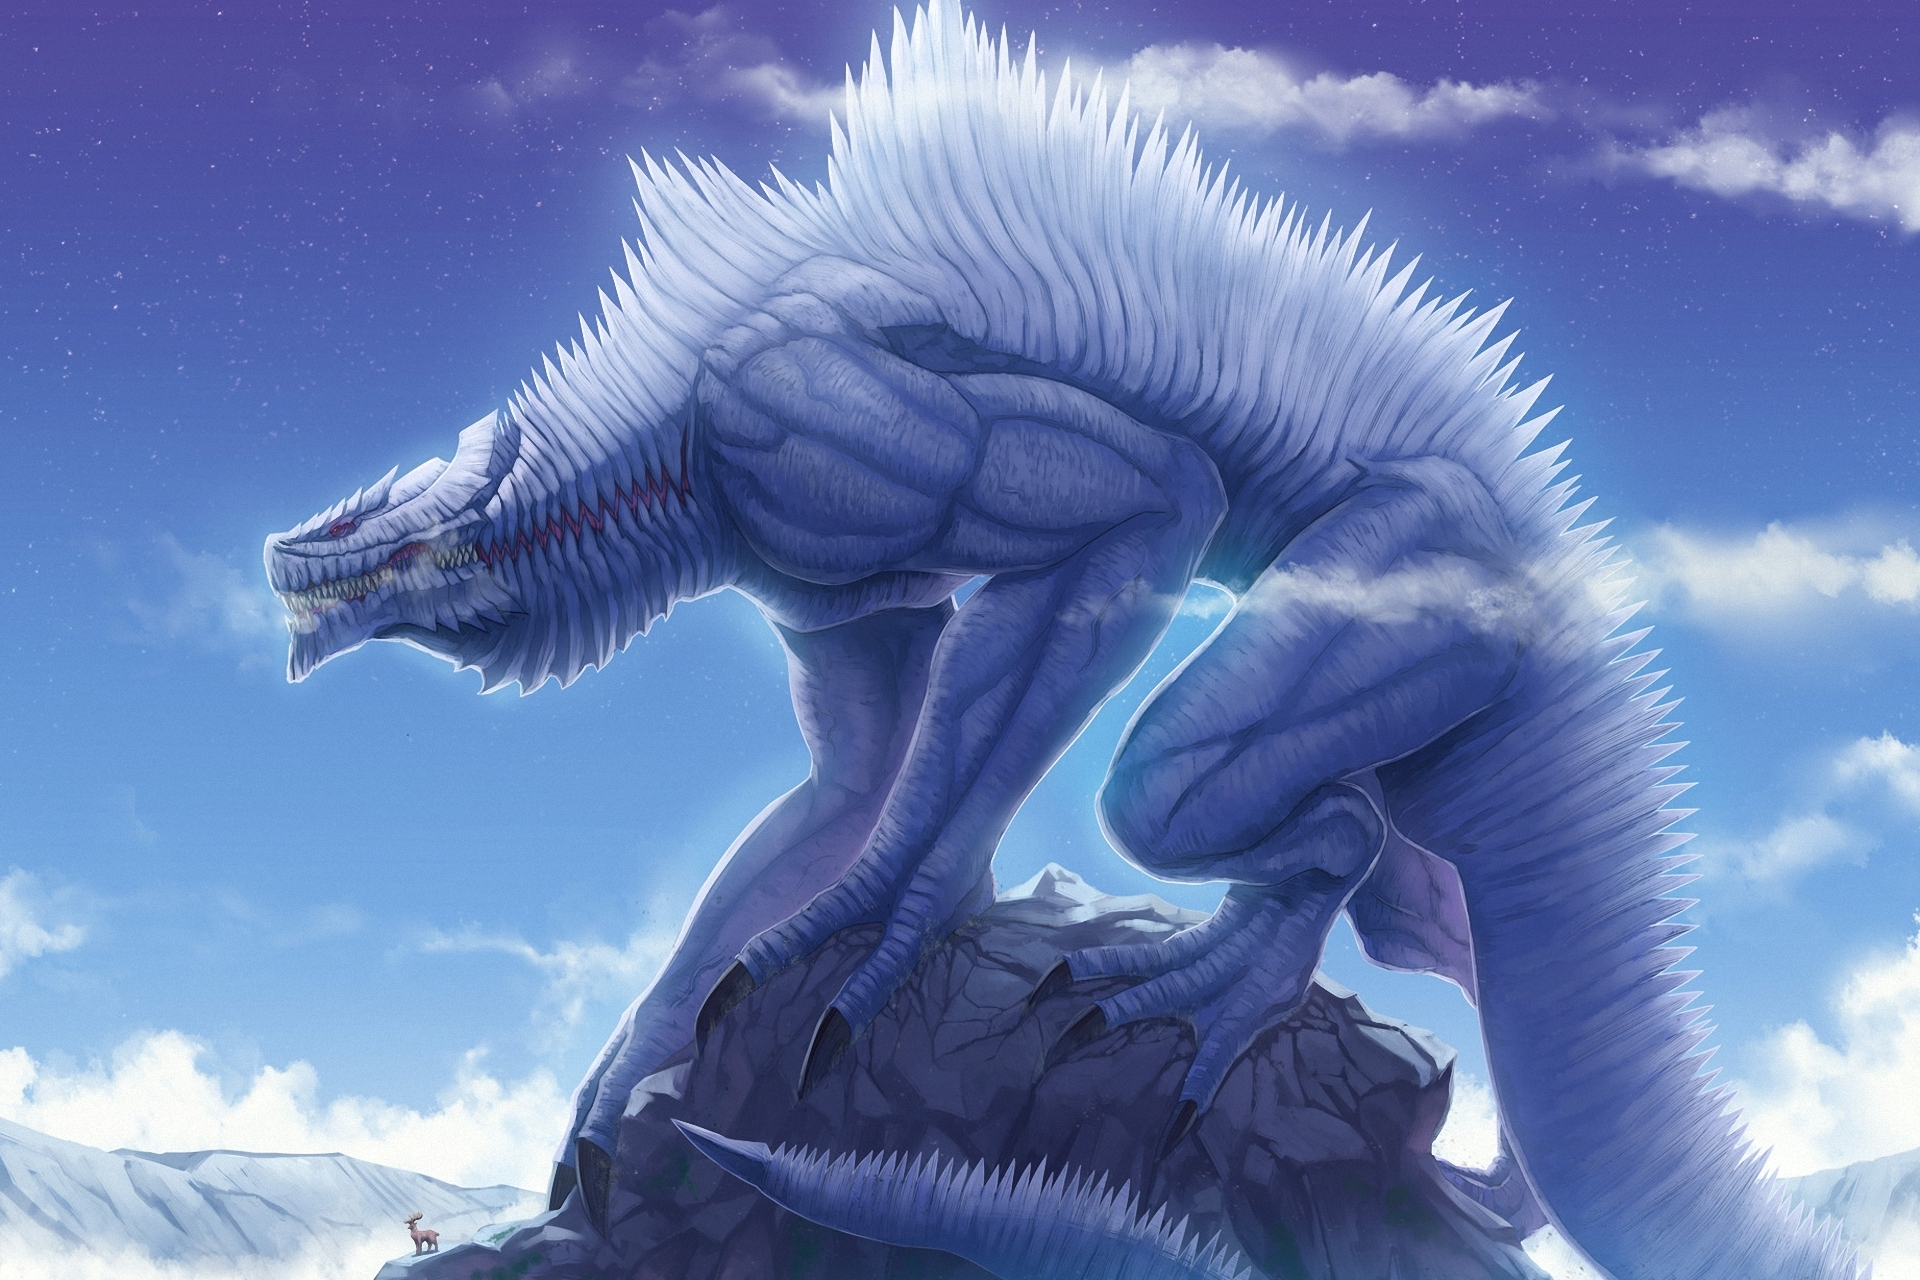 Dragon hybrid anime exposed vids